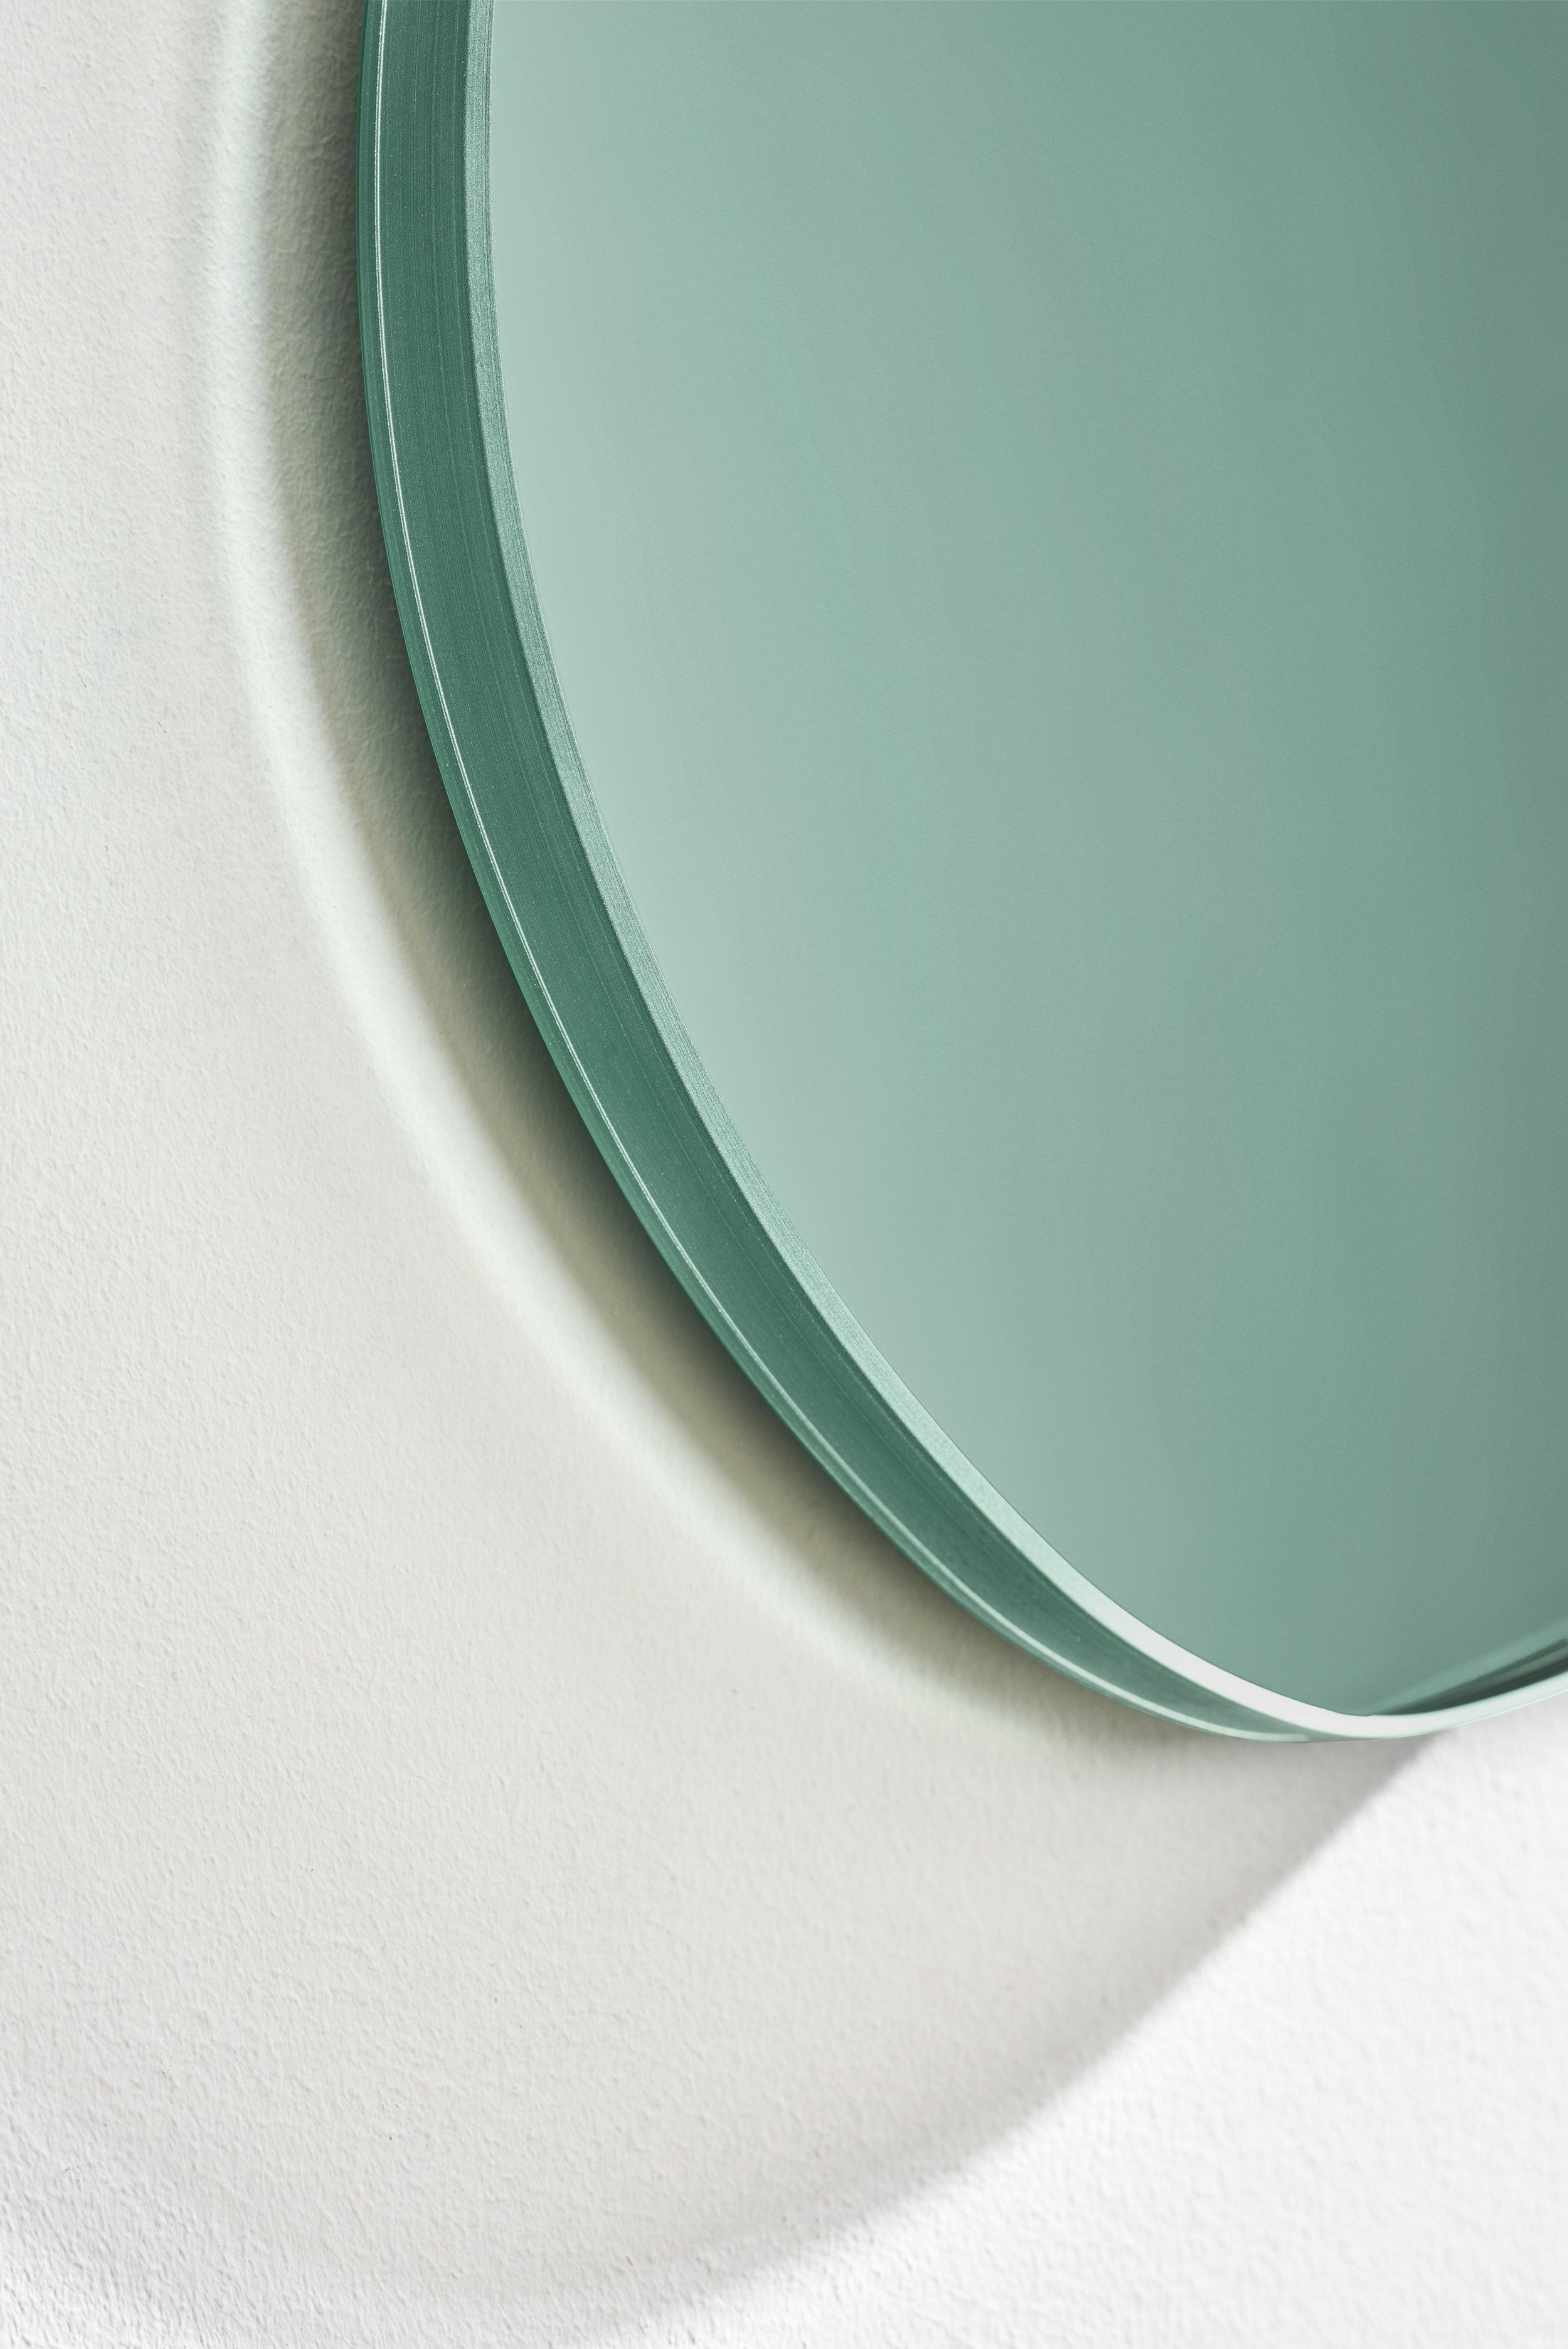 green_detail.jpg